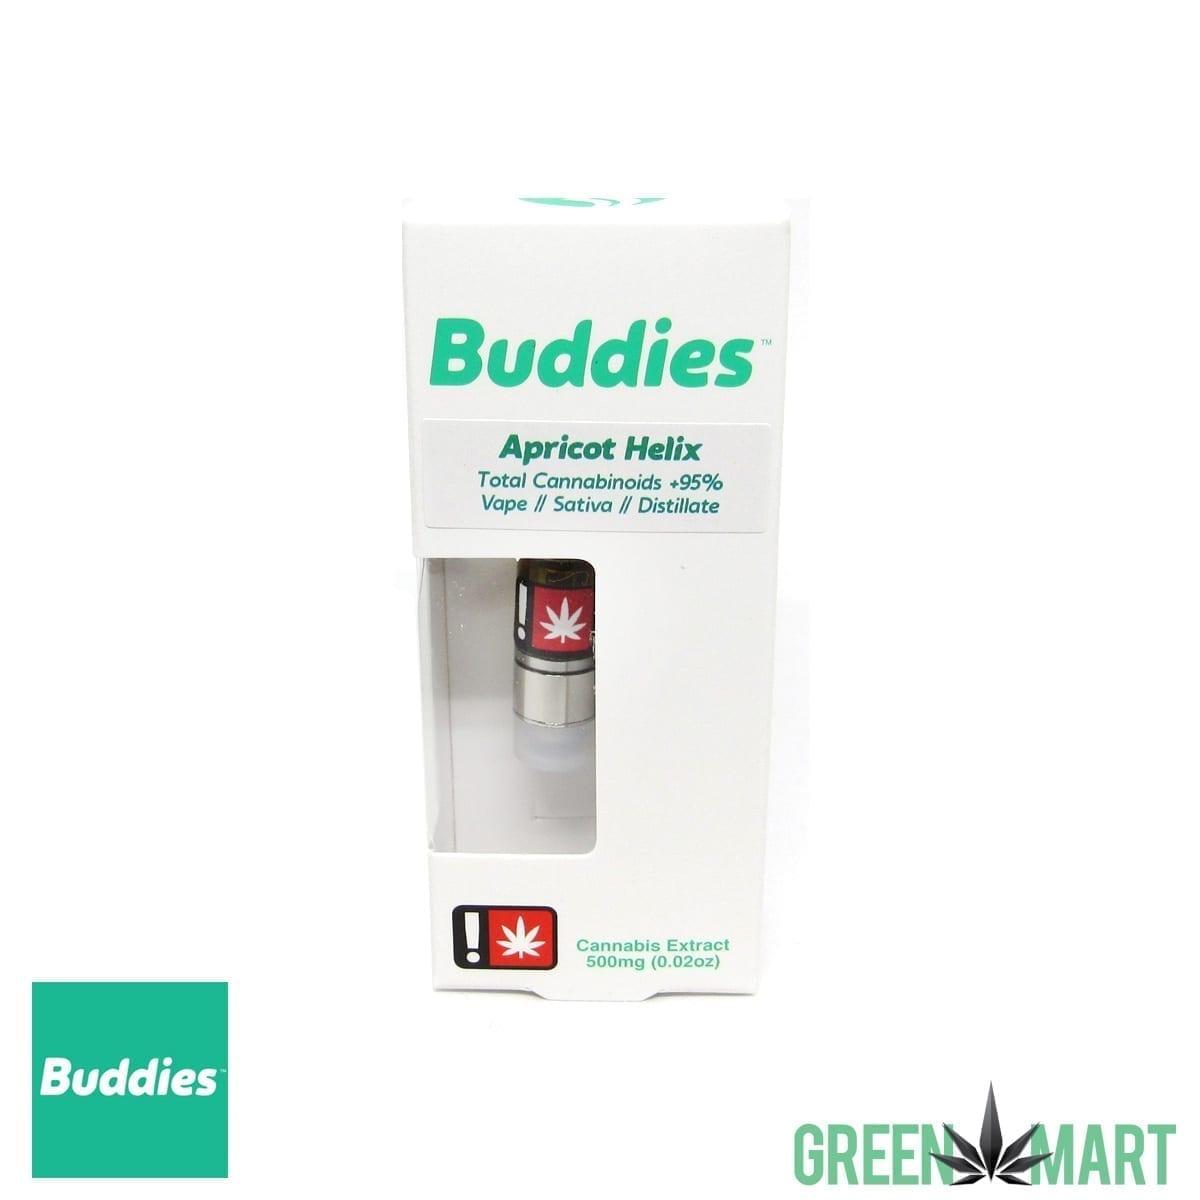 Buddies Brand Distillate Cartridge - Apricot Helix